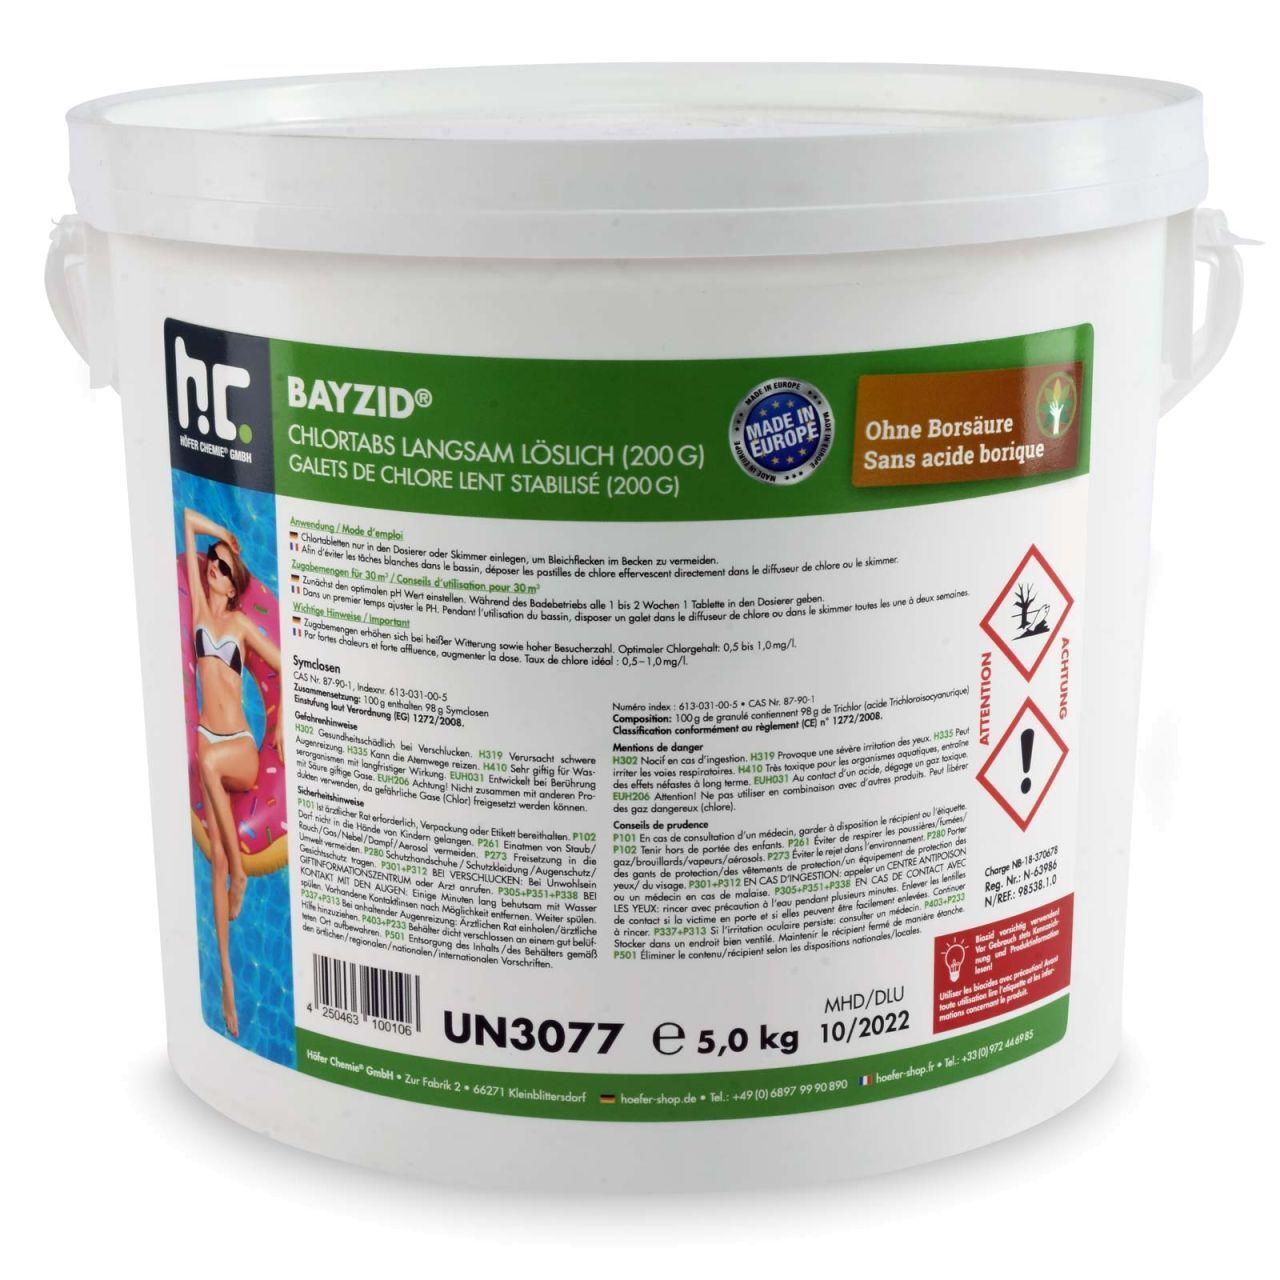 BAYZID 5 kg Bayzid® Galets de chlore lent (200g) (1 x 5 kg)